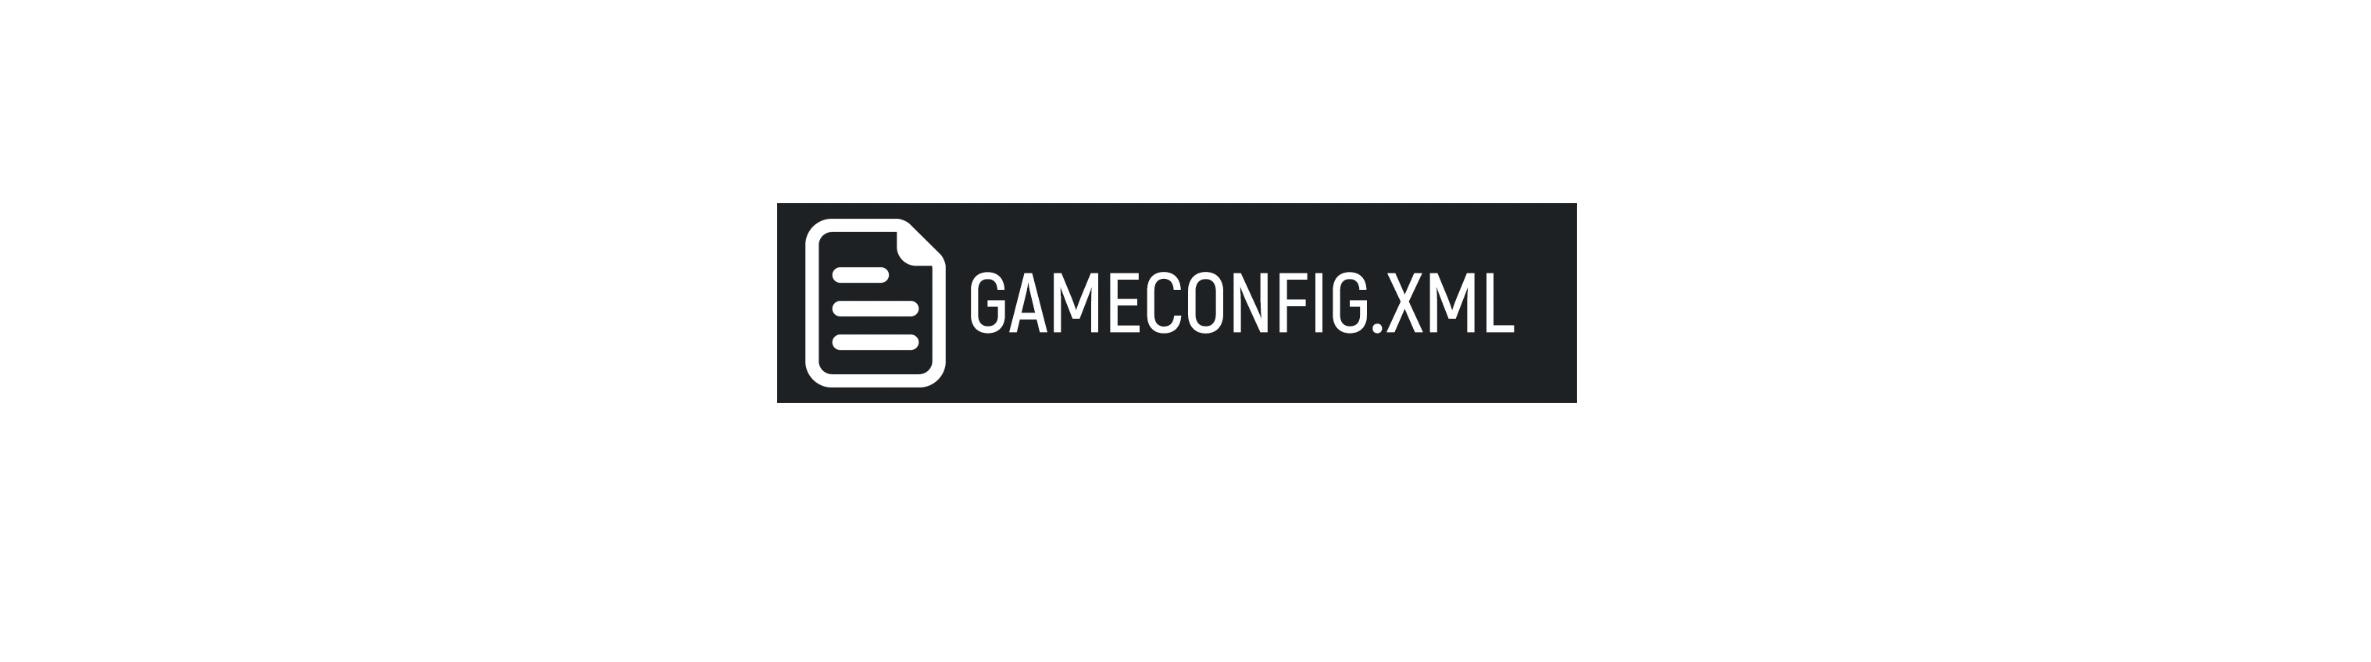 Gameconfig.xml 4.0 Diamond Casino DLC / Story Mode Fixes